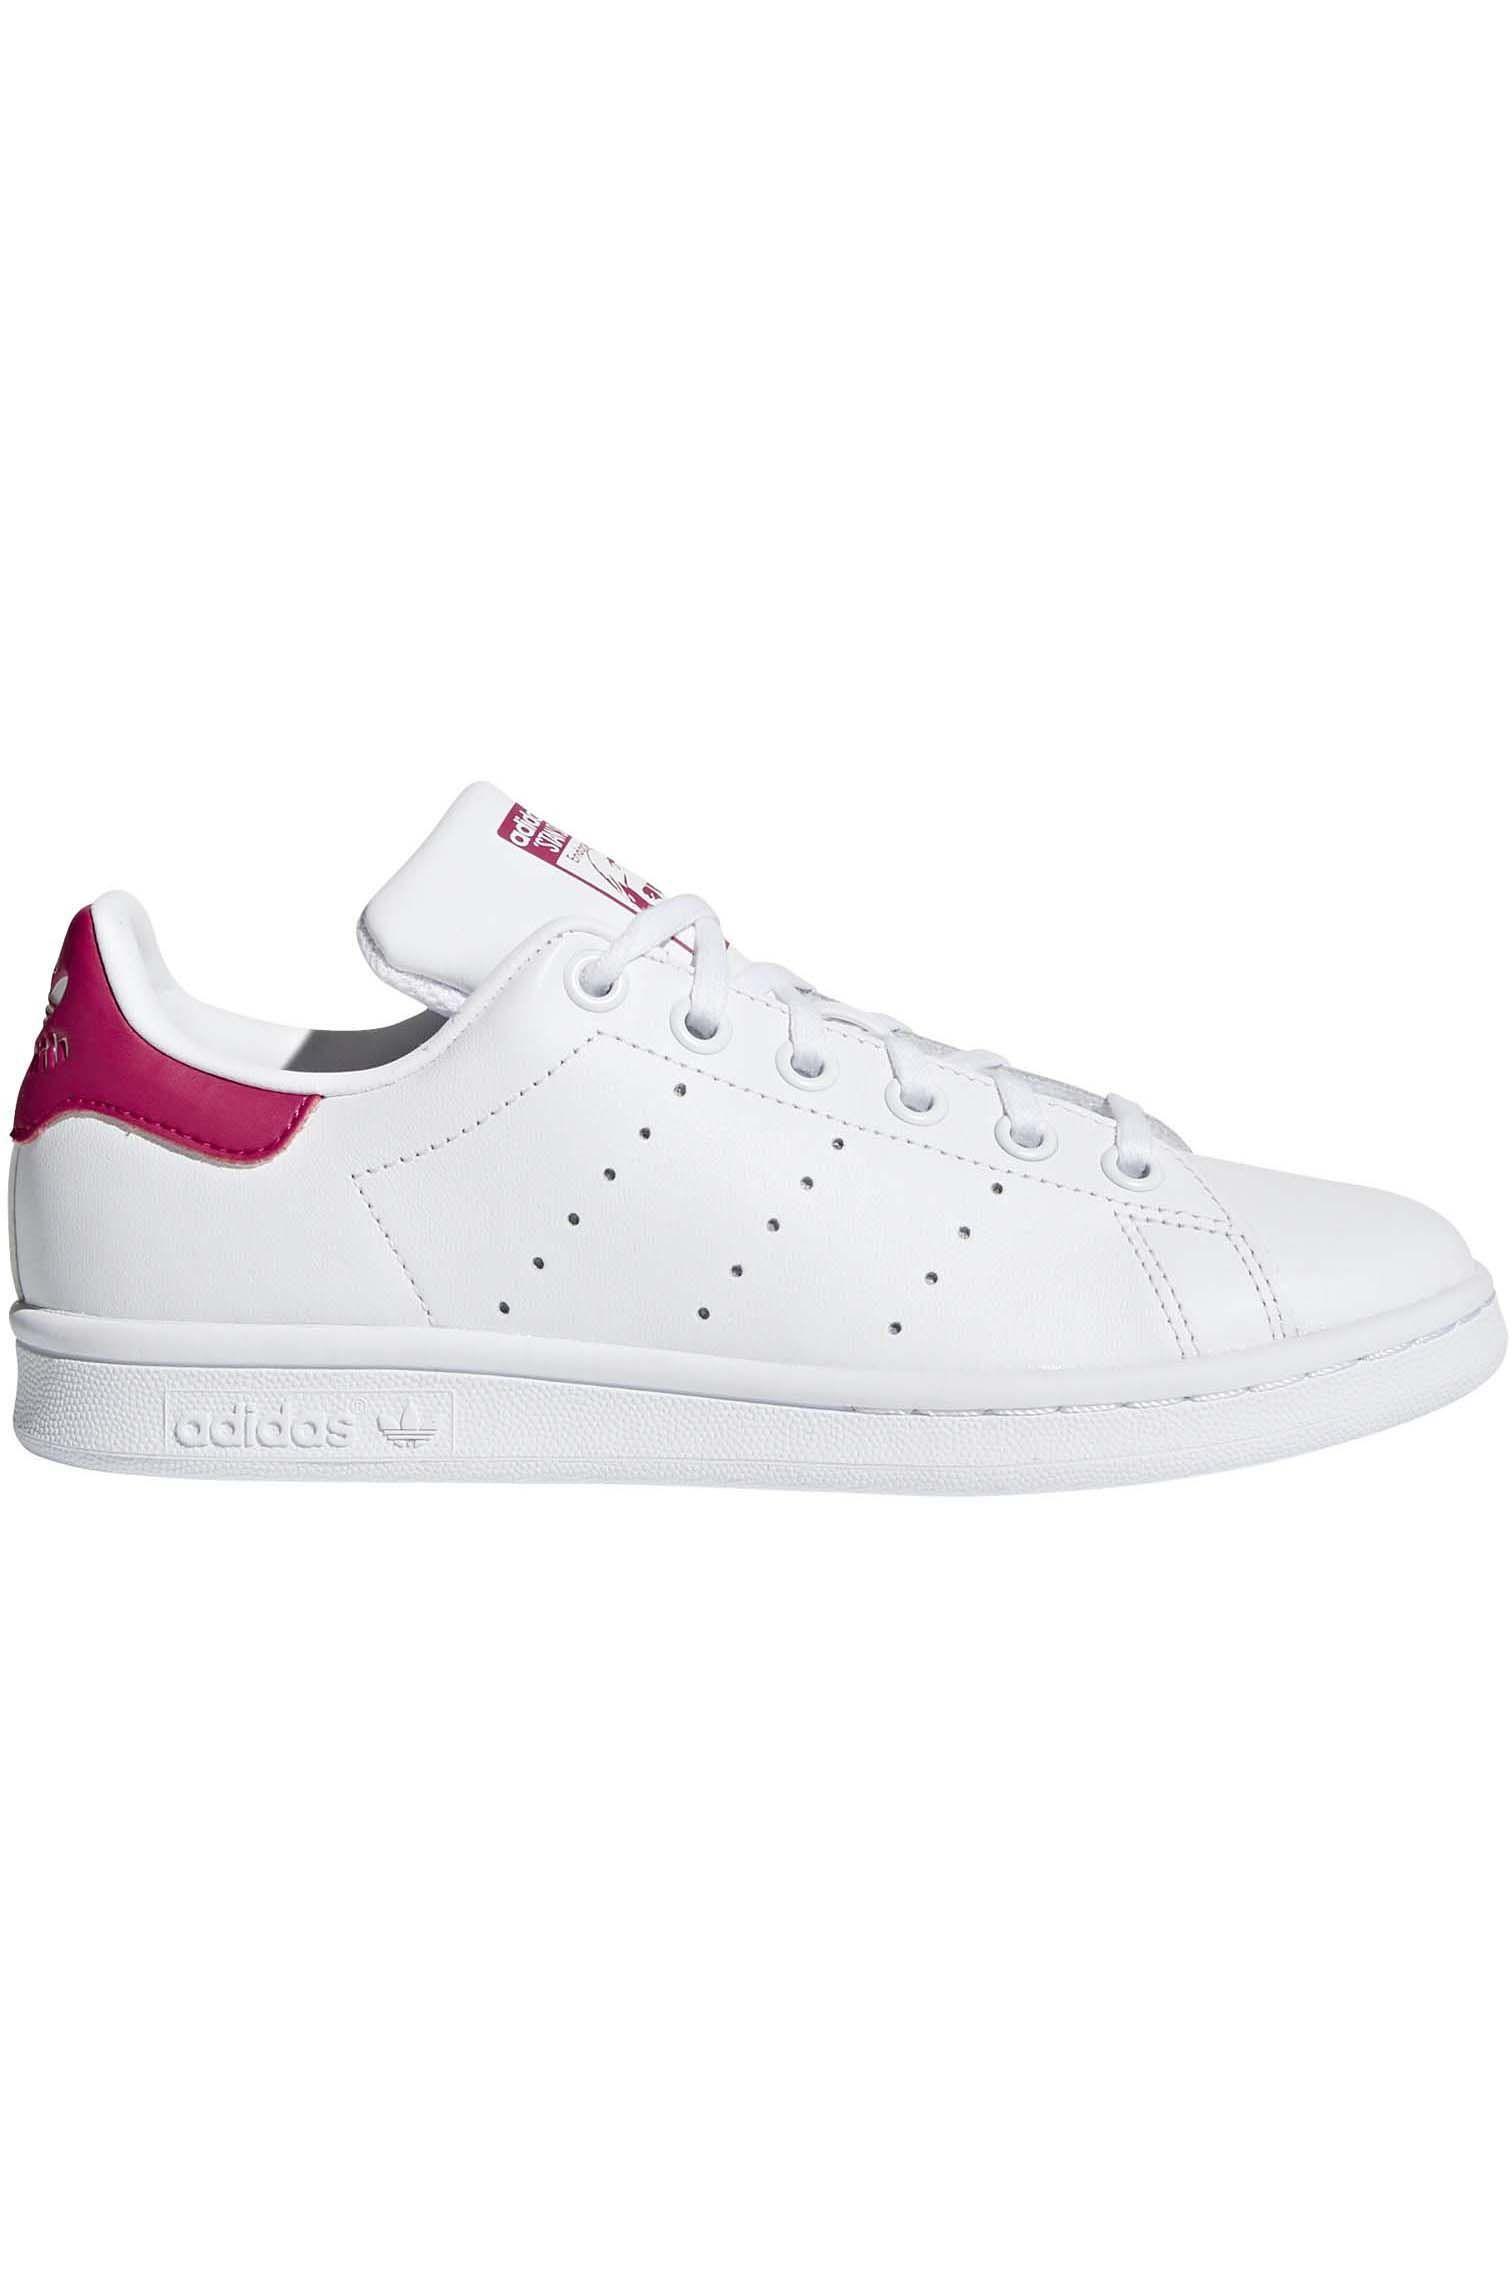 Tenis Adidas STAN SMITH J Ftwr White/Ftwr White/Bold Pink